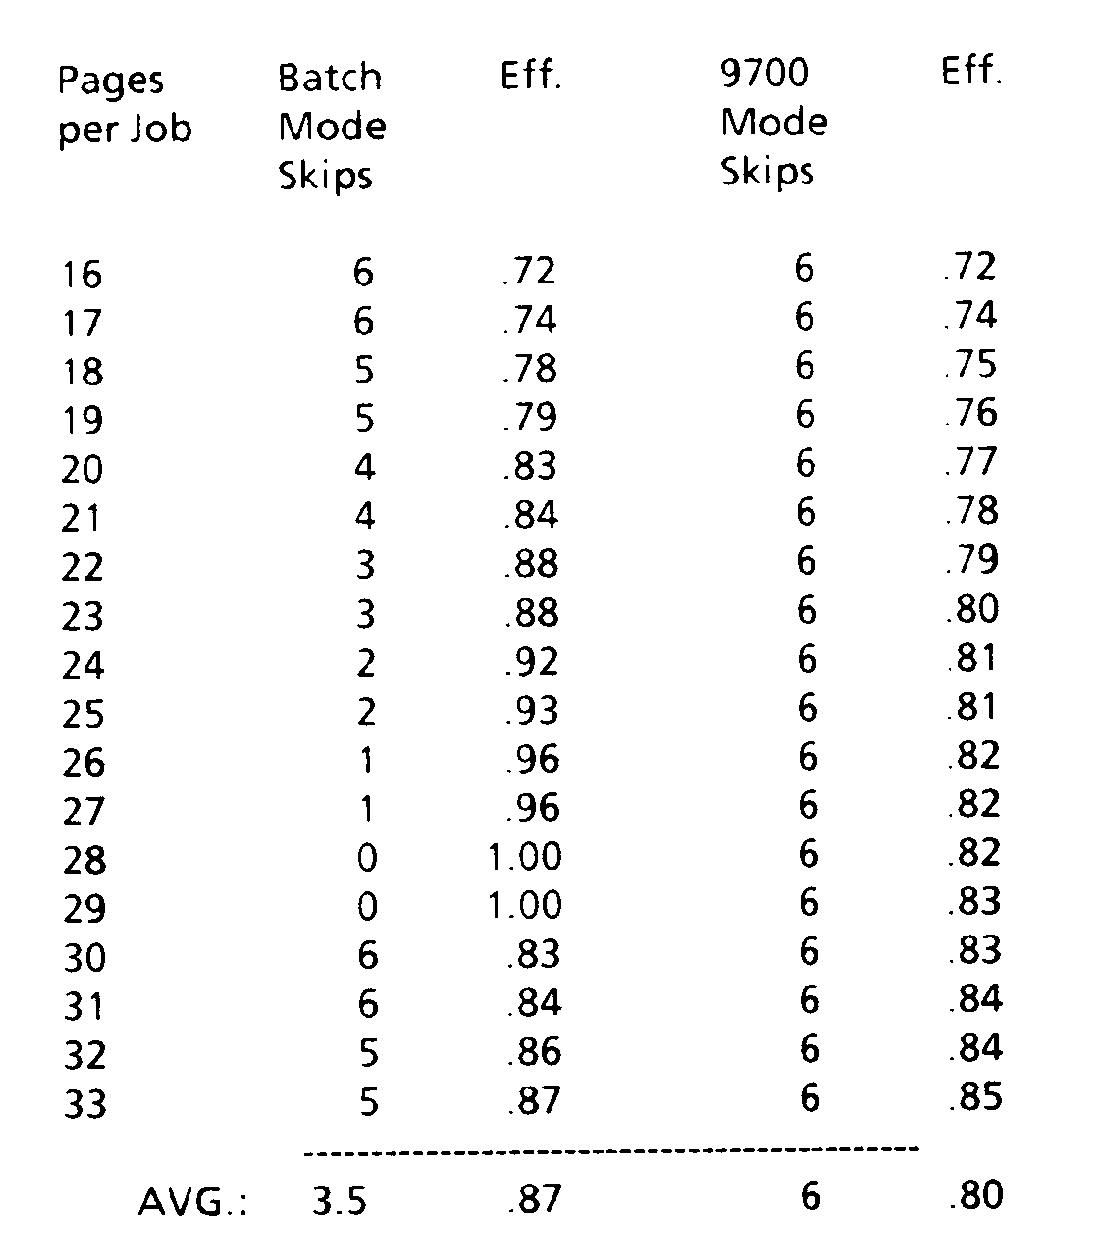 EP0409627B1 - Batch mode duplex printing - Google Patents